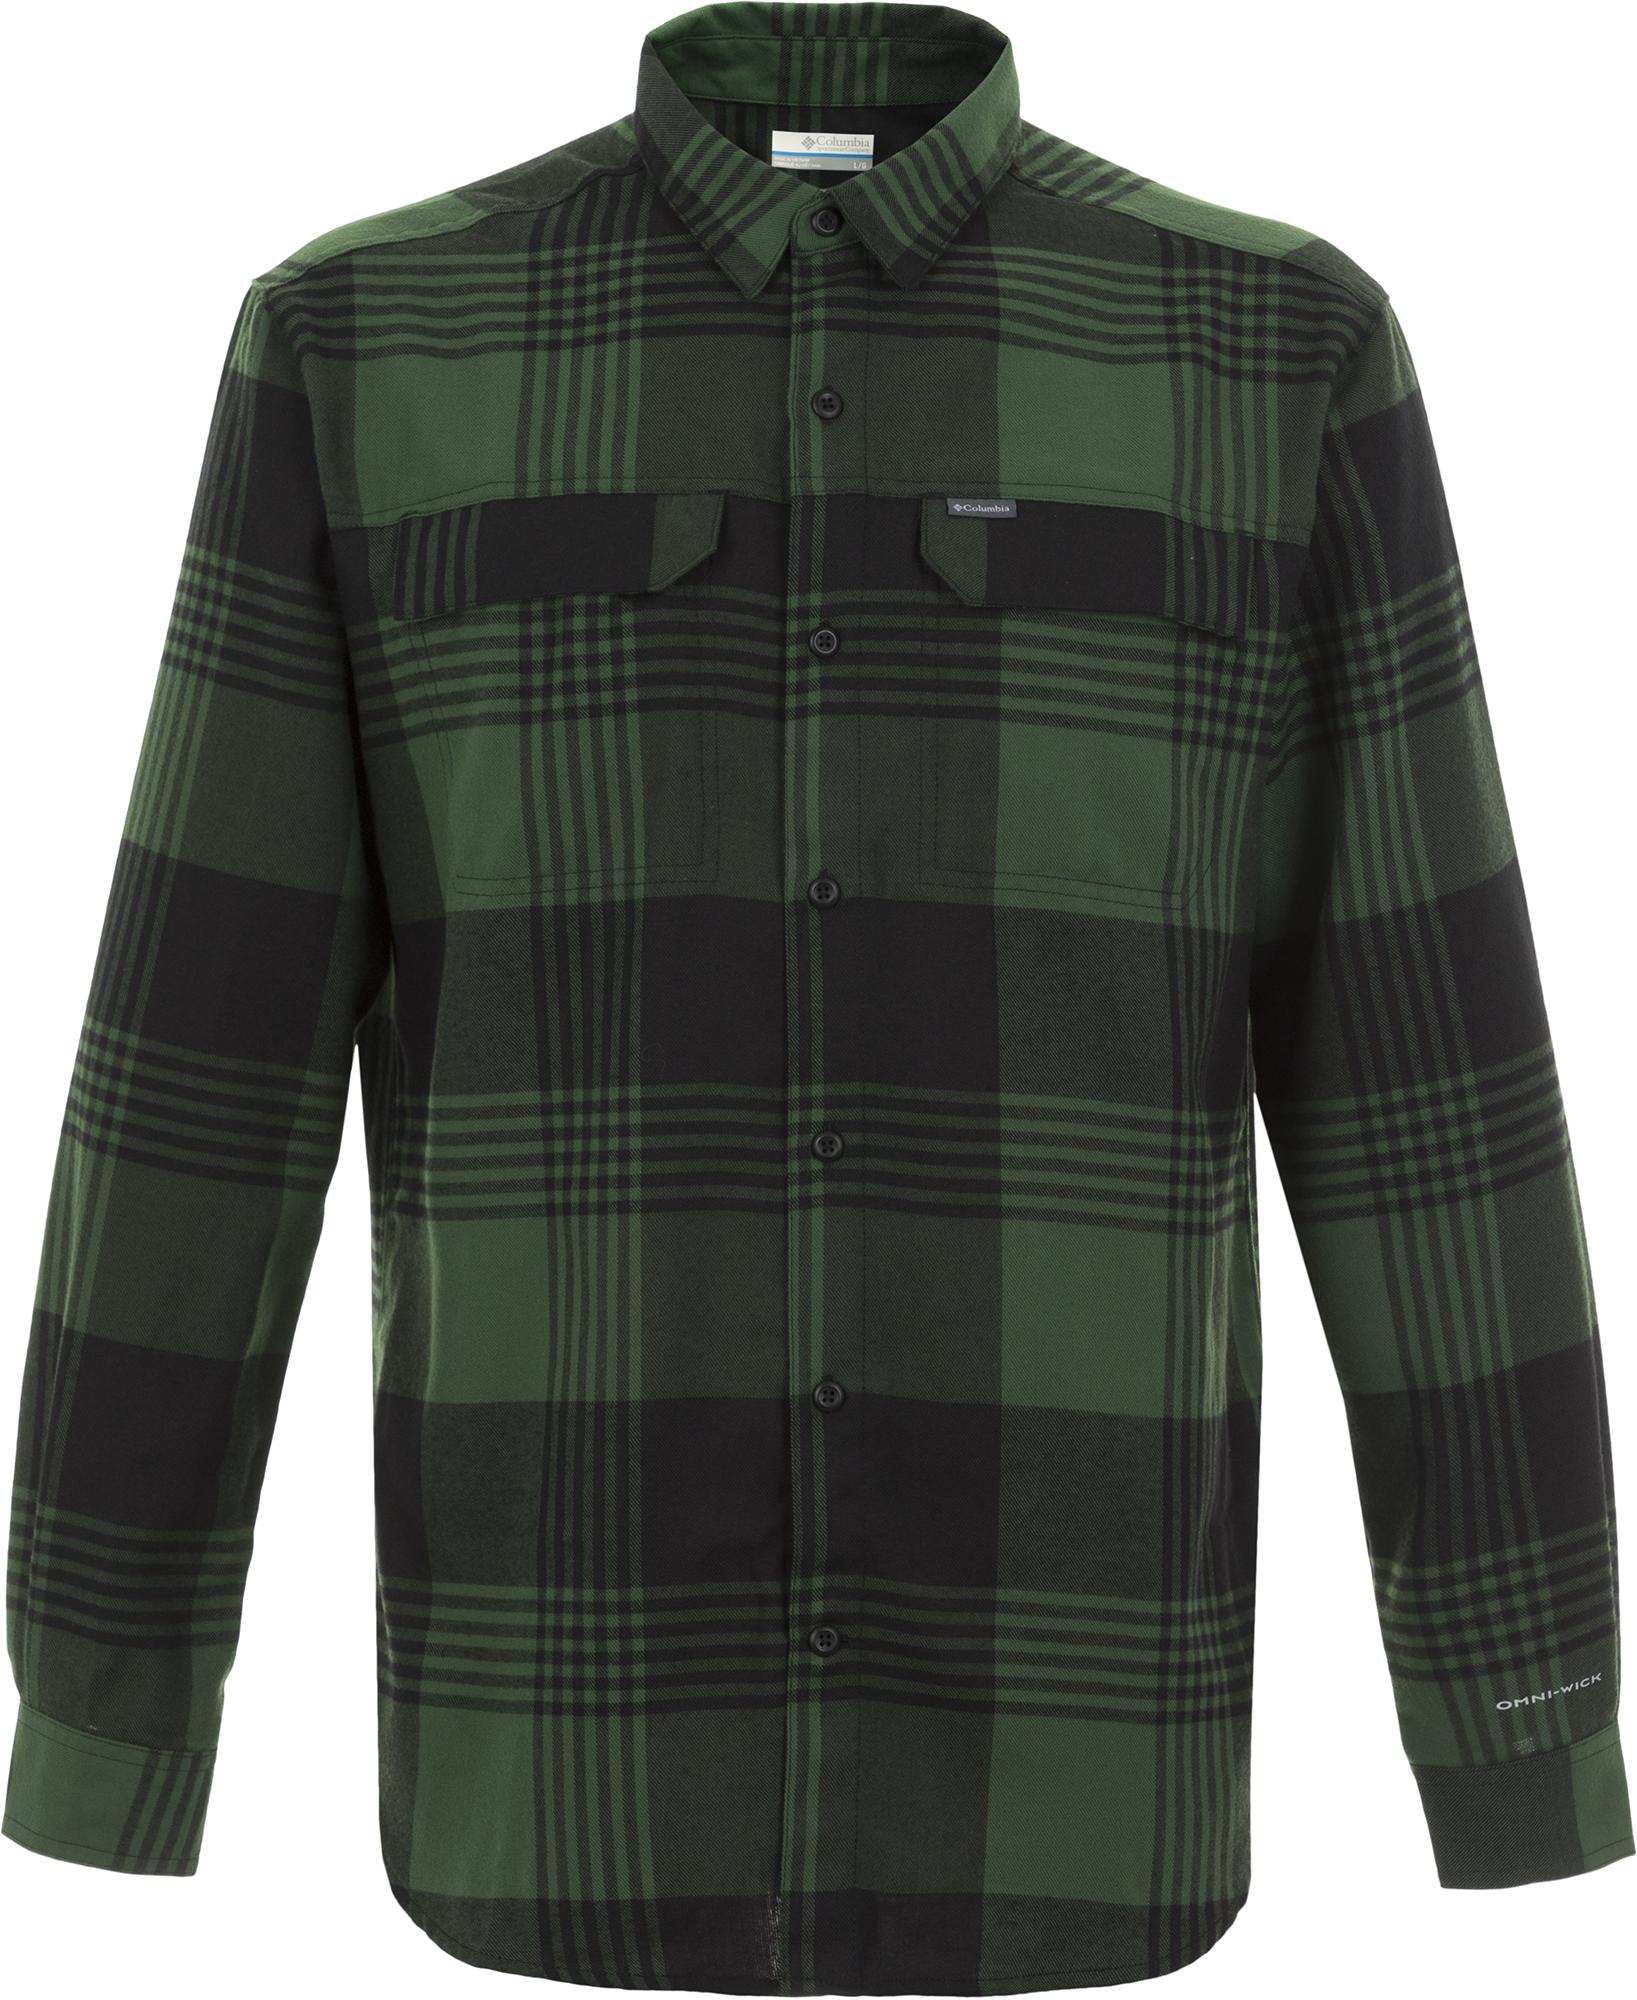 цена Columbia Рубашка мужская Columbia Silver Ridge 2.0, размер 56-58 онлайн в 2017 году